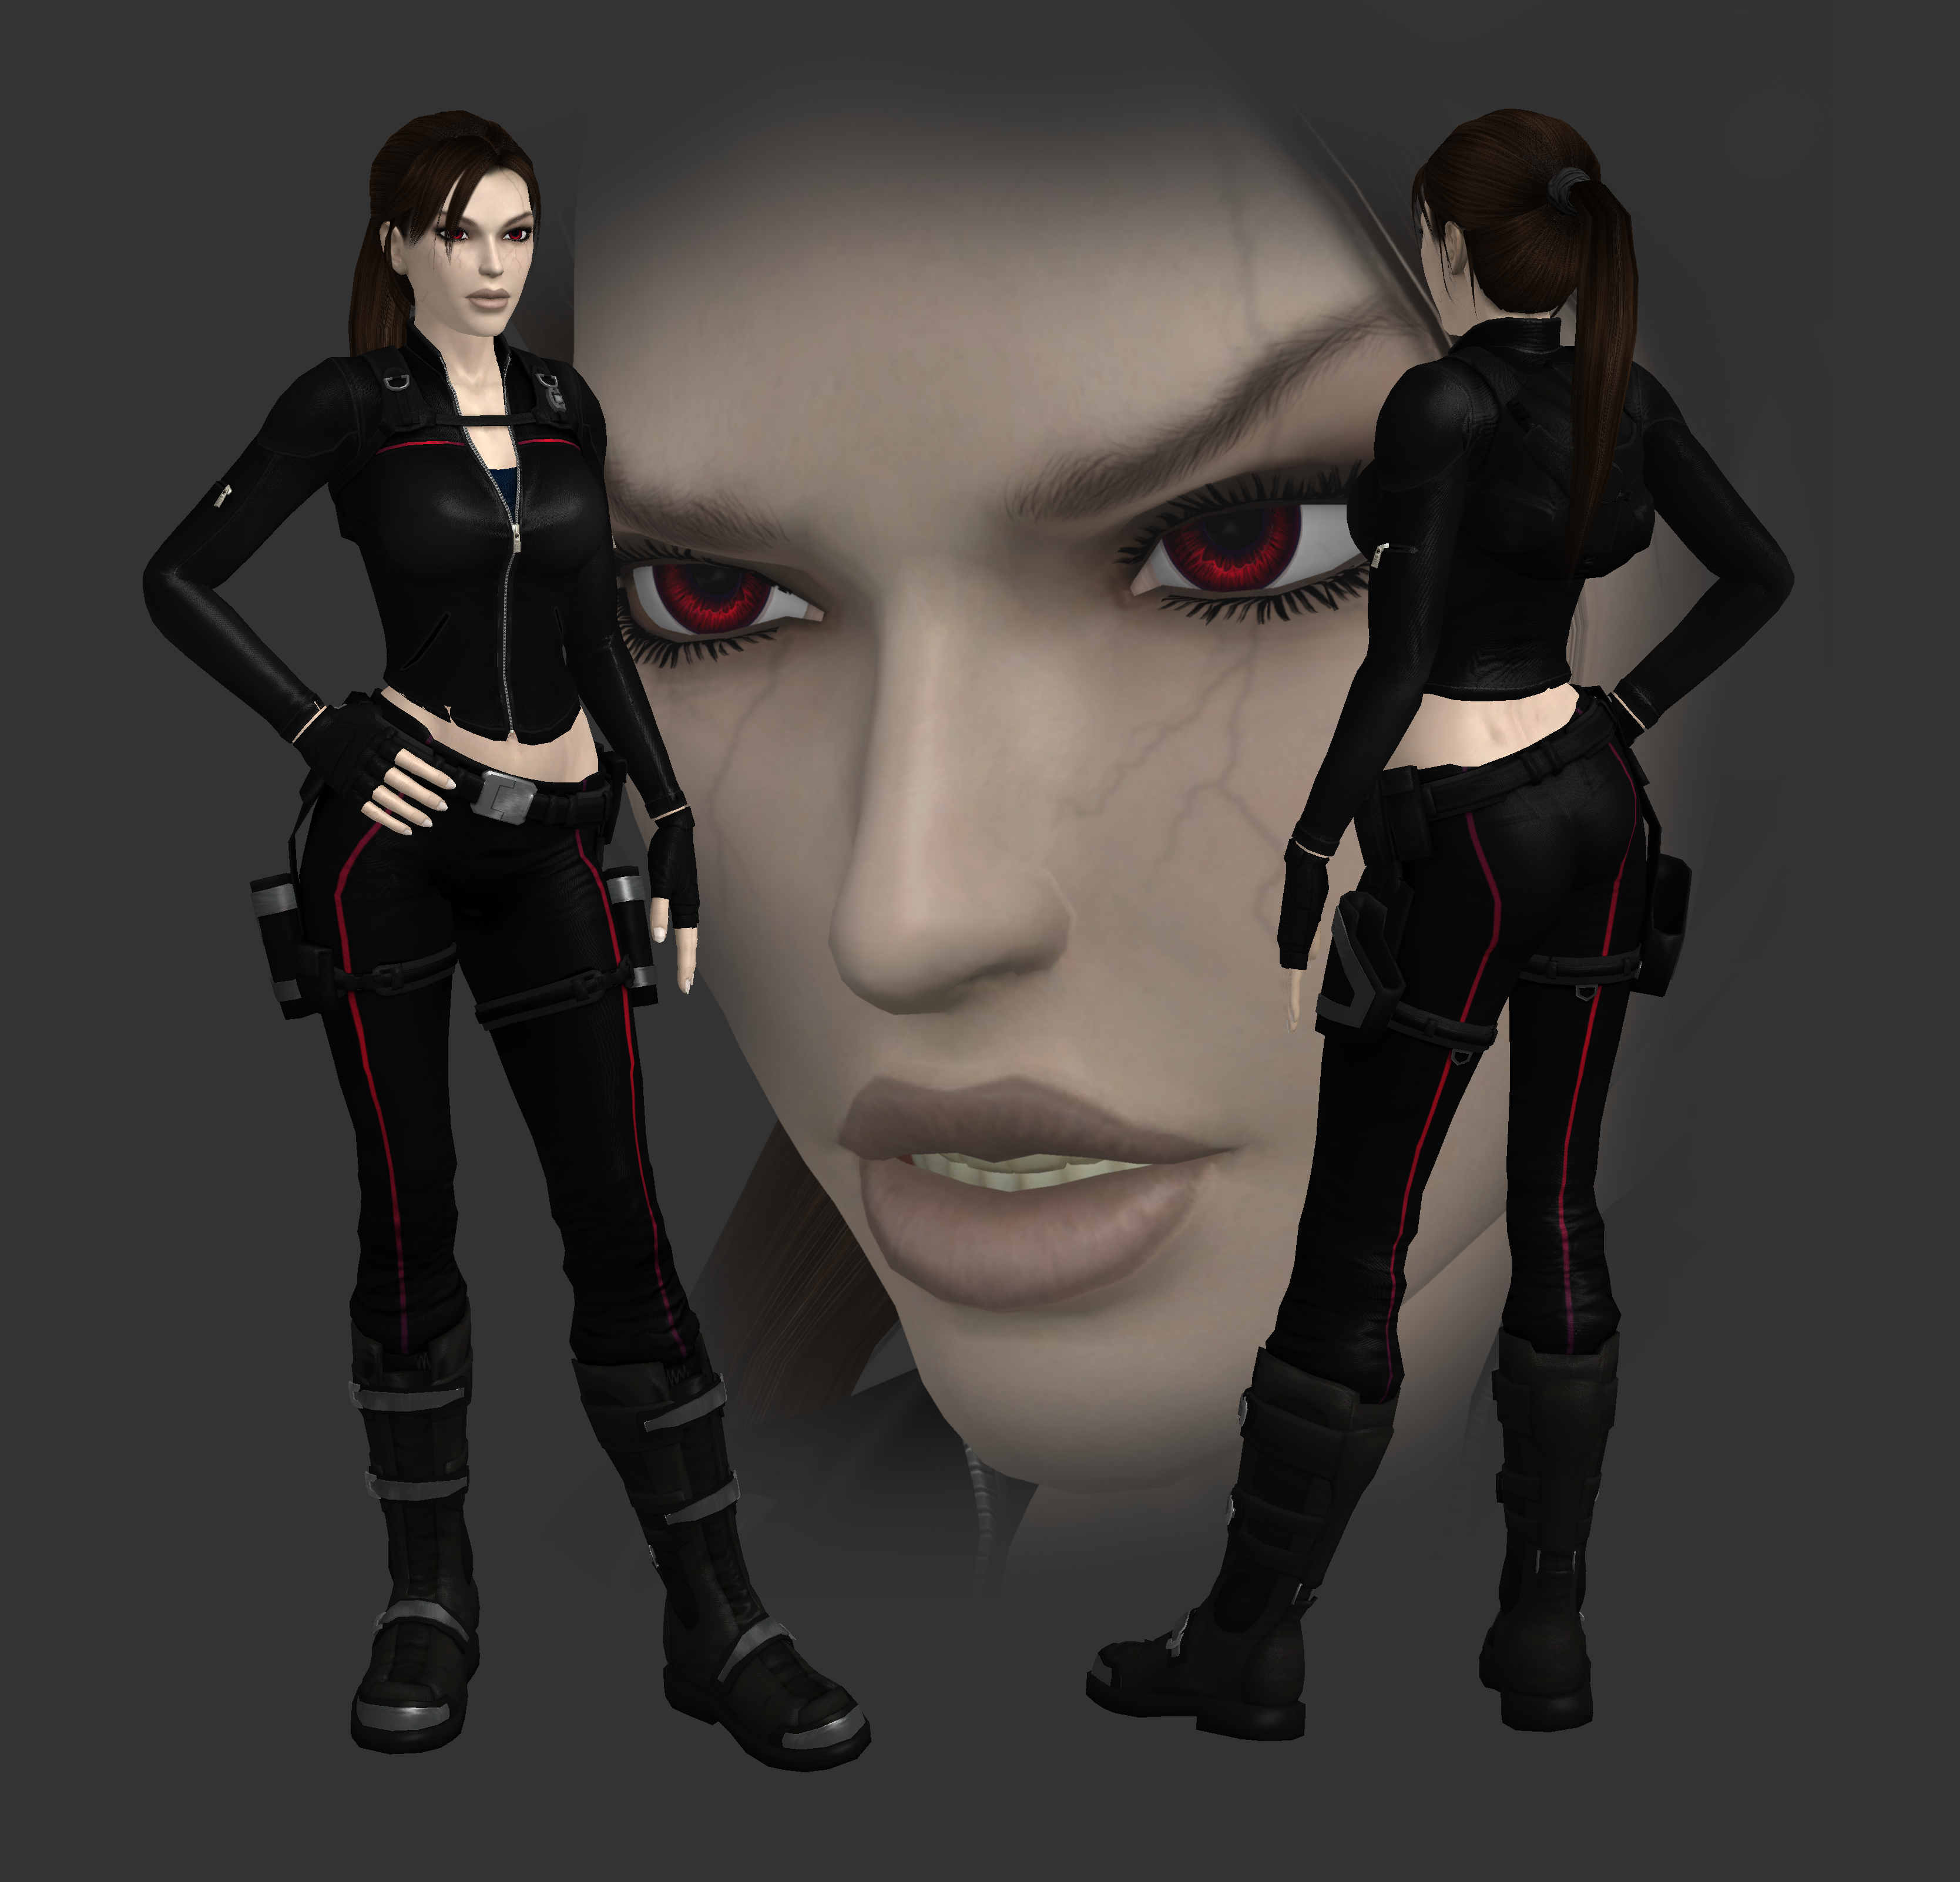 3d Tomb Raider Wallpaper: Lara Croft Vampire Version By Spuros12 By Spuros12 On